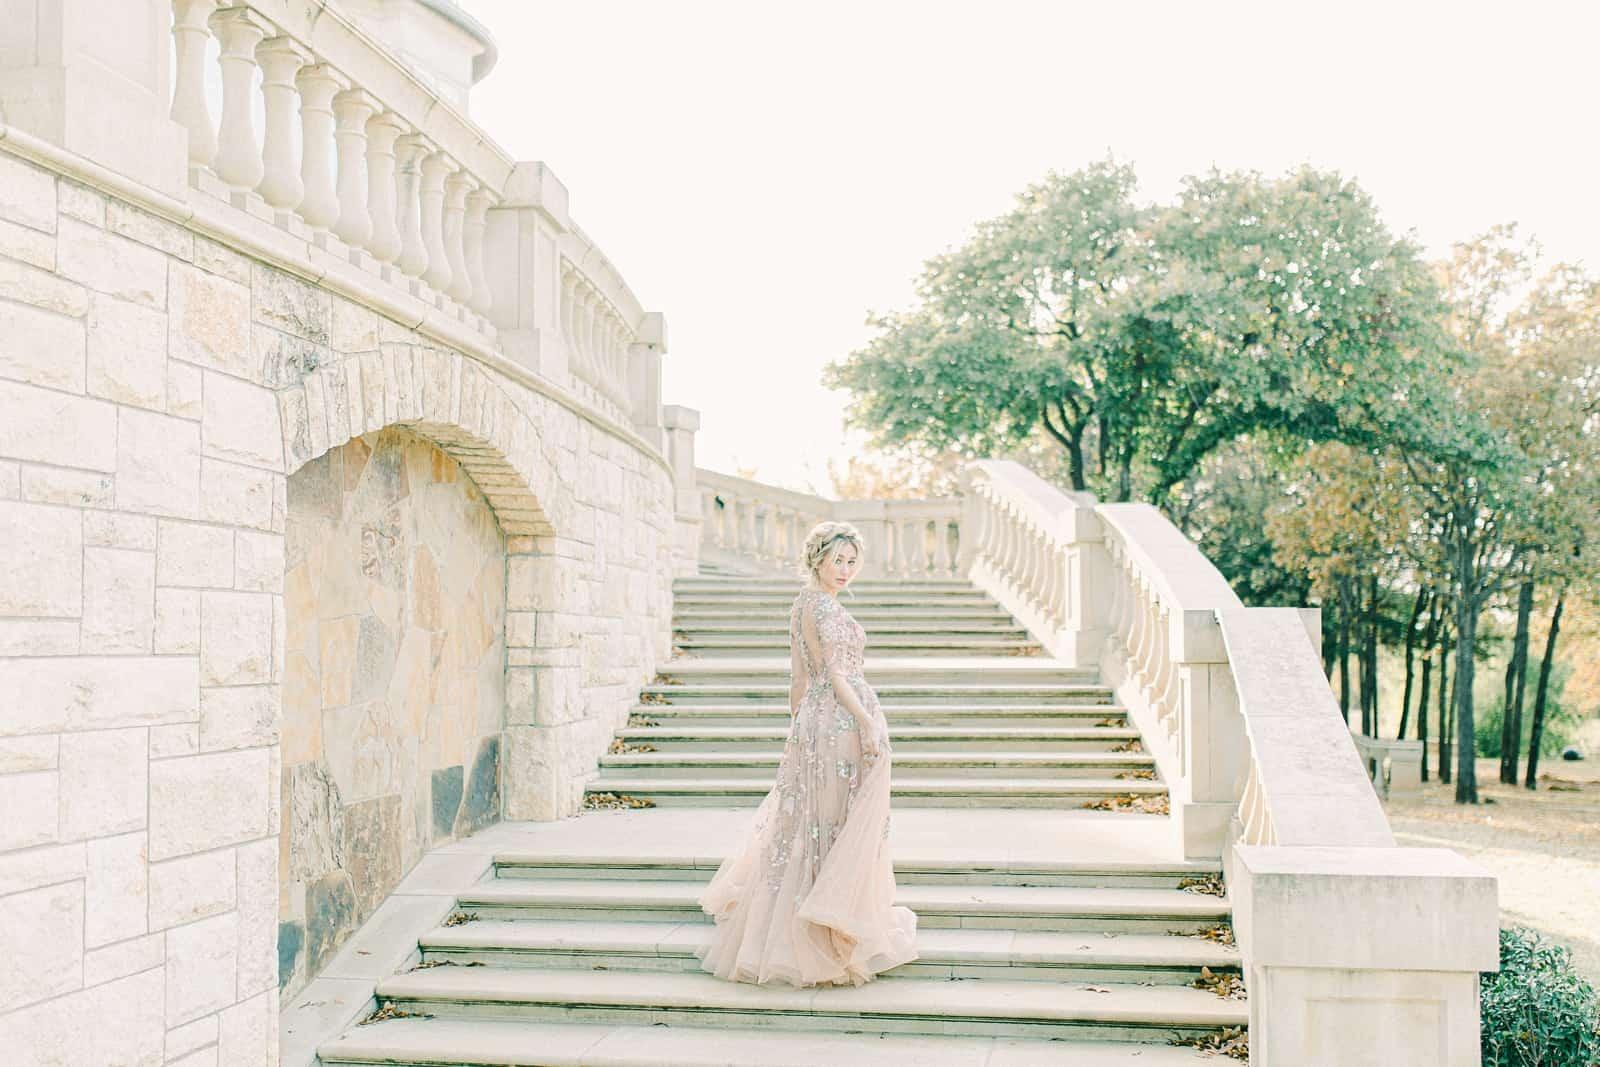 European inspired wedding venue, bride on sweeping marble staircase